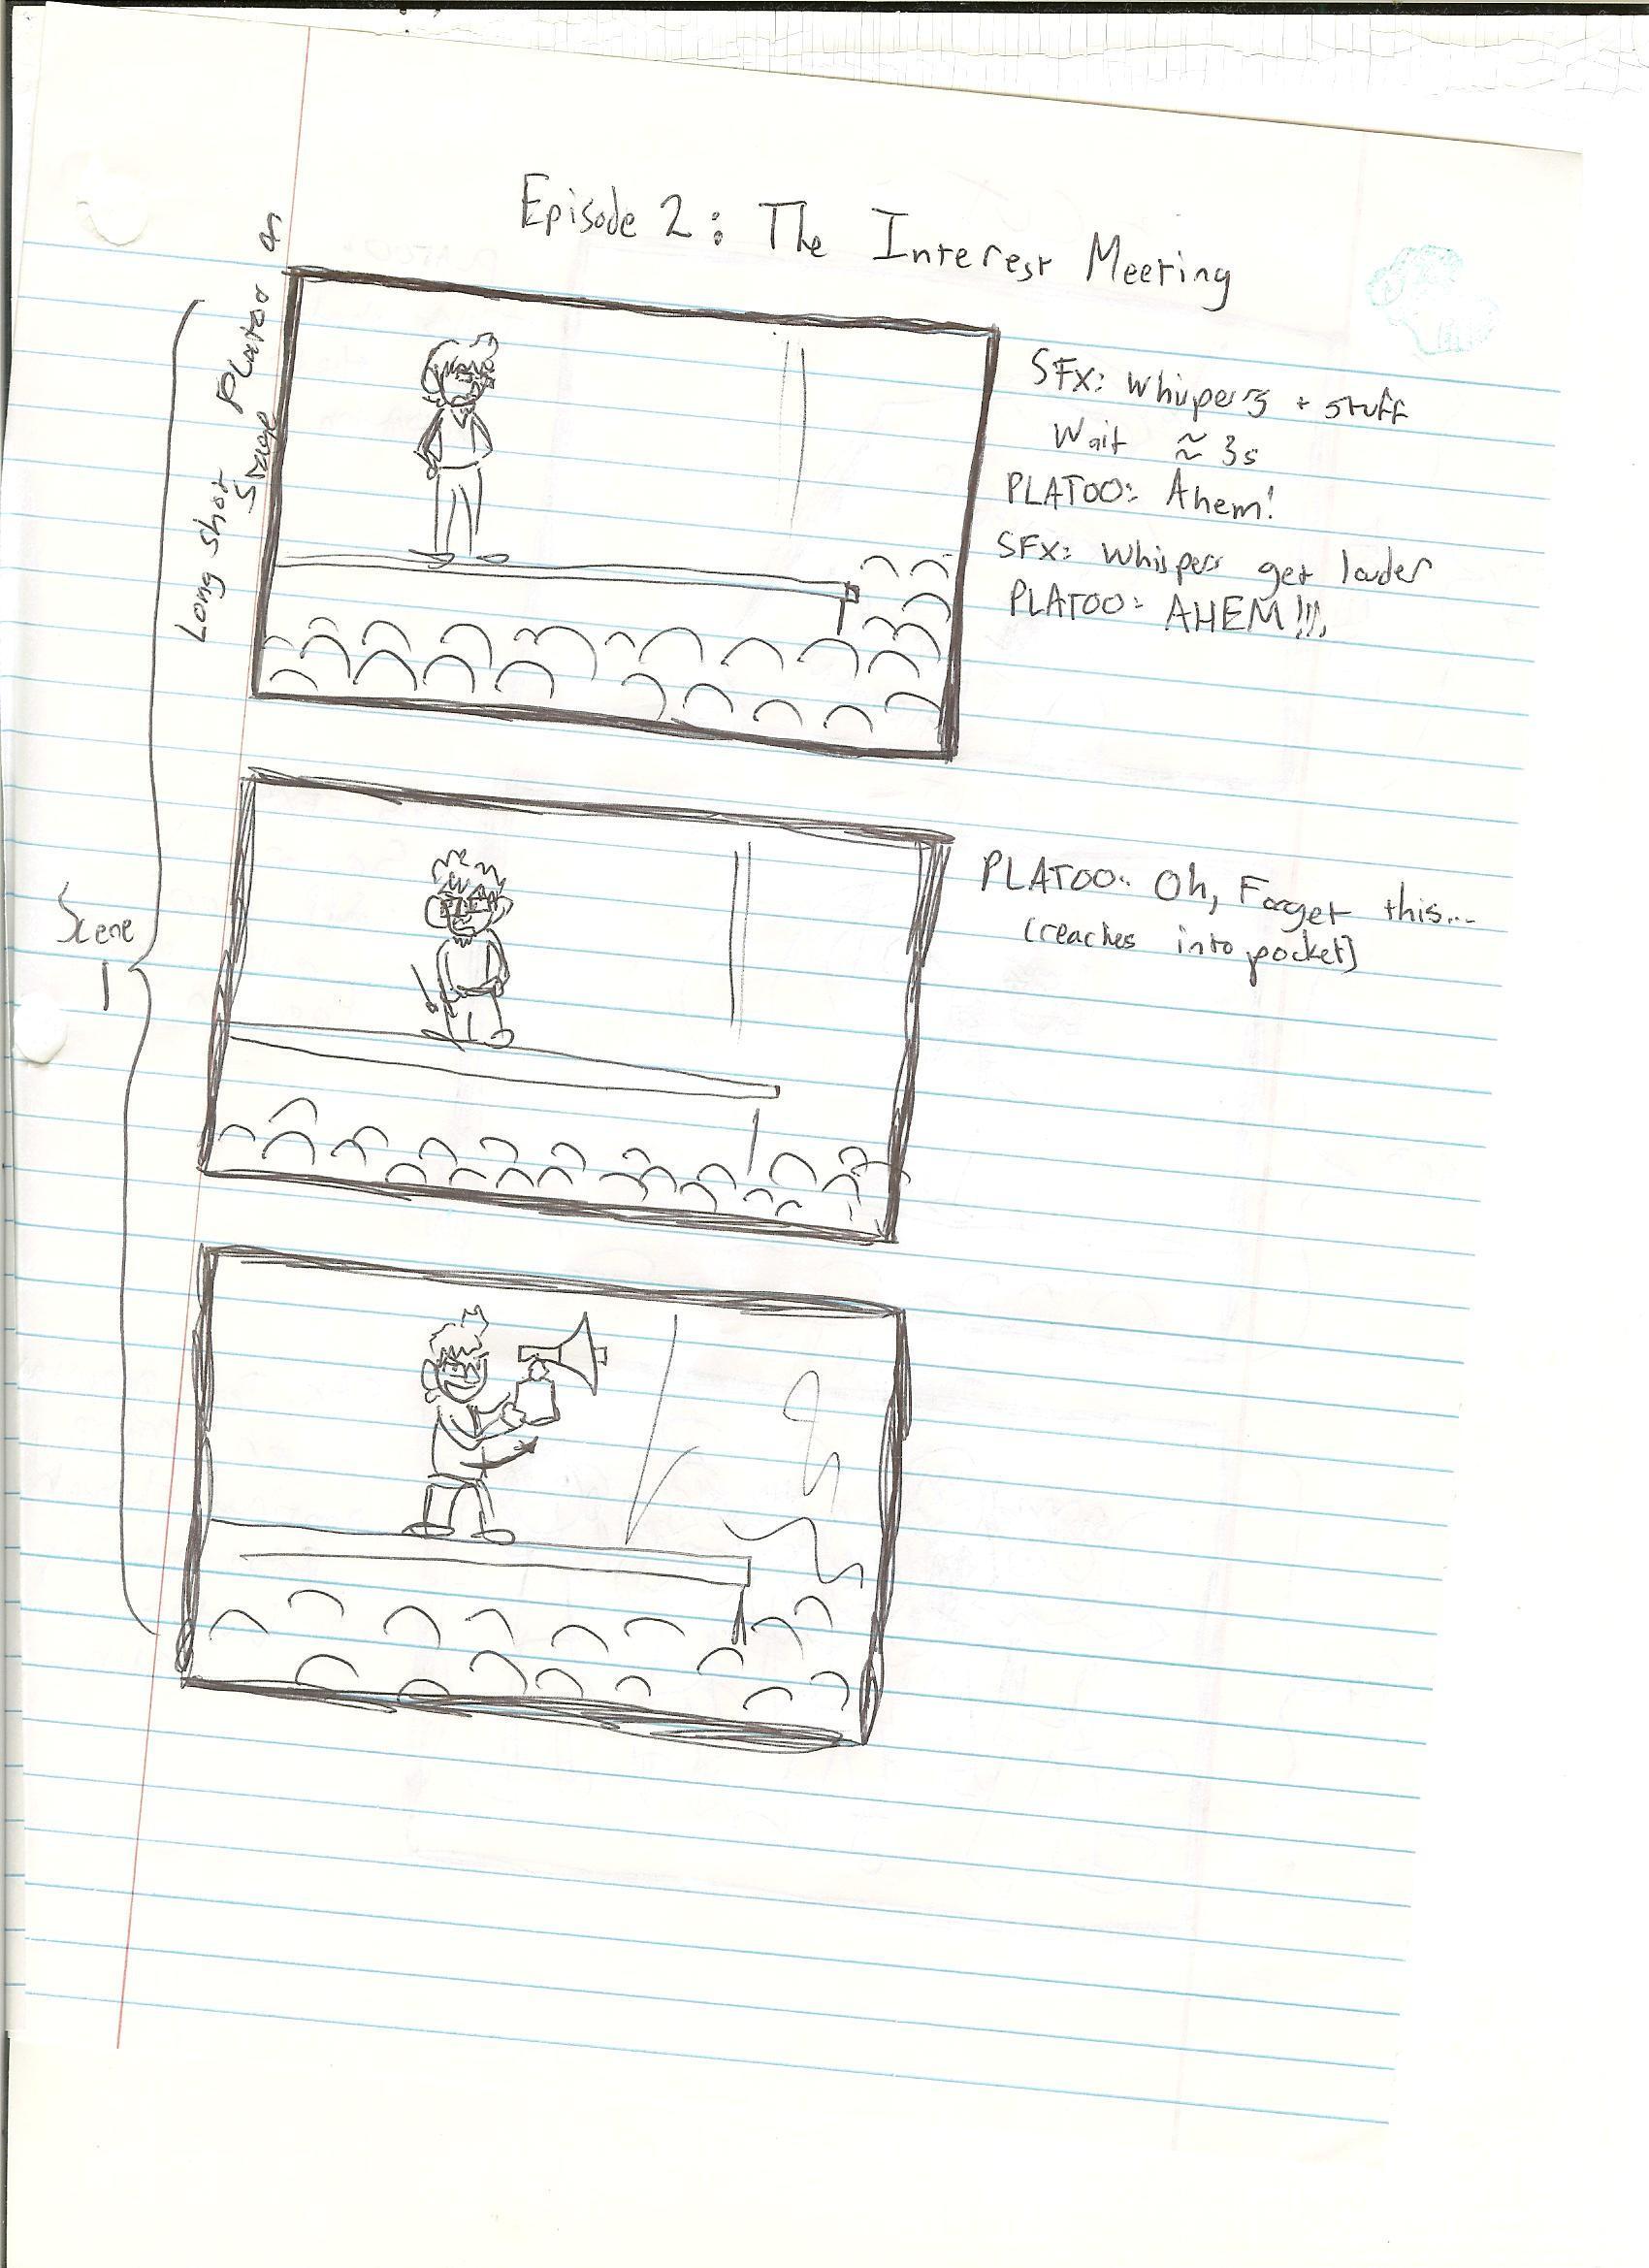 Musical Misadventures Episode 2 Storyboard by Walkdox